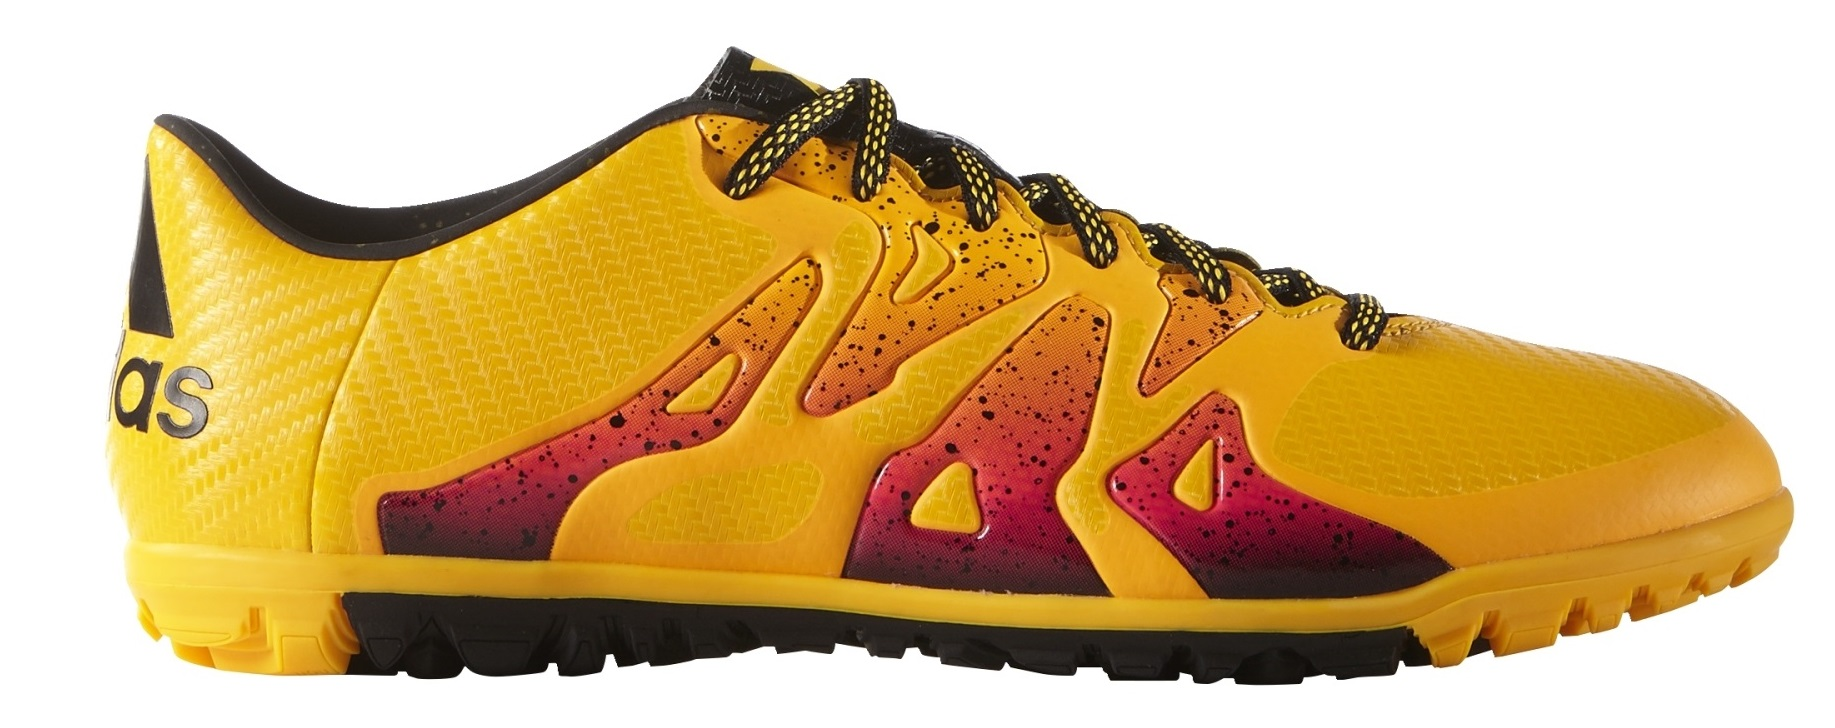 8a56cc30625e Soccer Shoes X 15.3 Turf colore Yellow - Adidas - SportIT.com